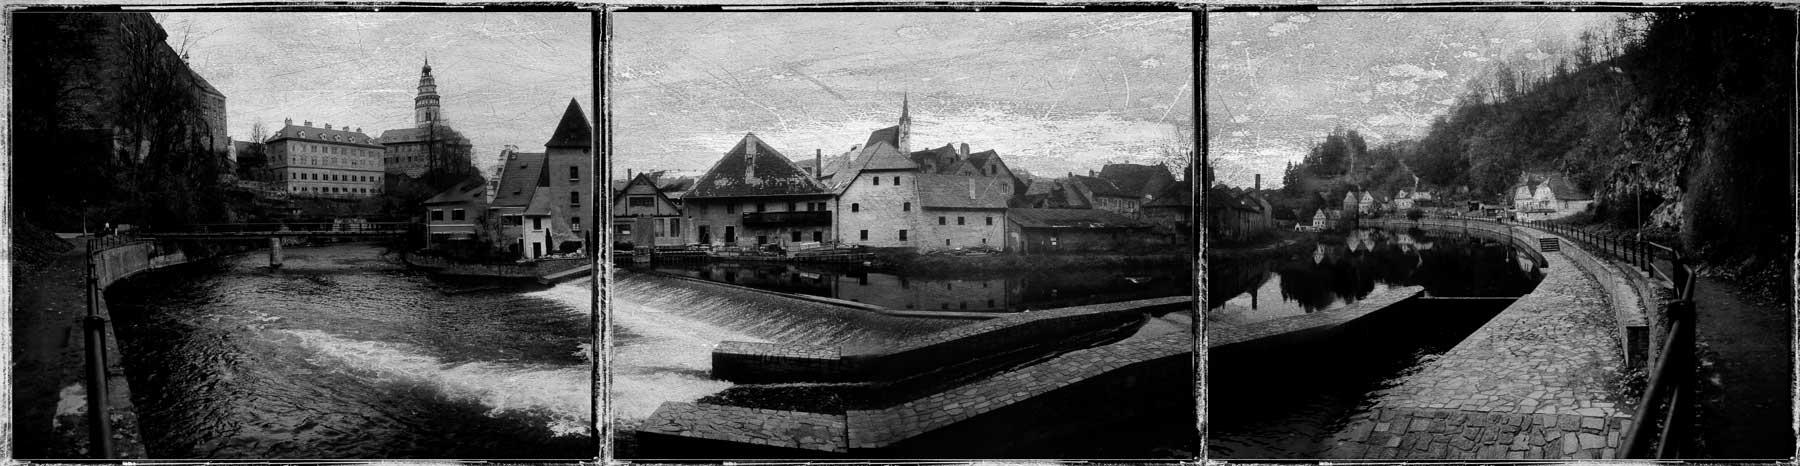 krumlov_panoramic_16.5.jpg